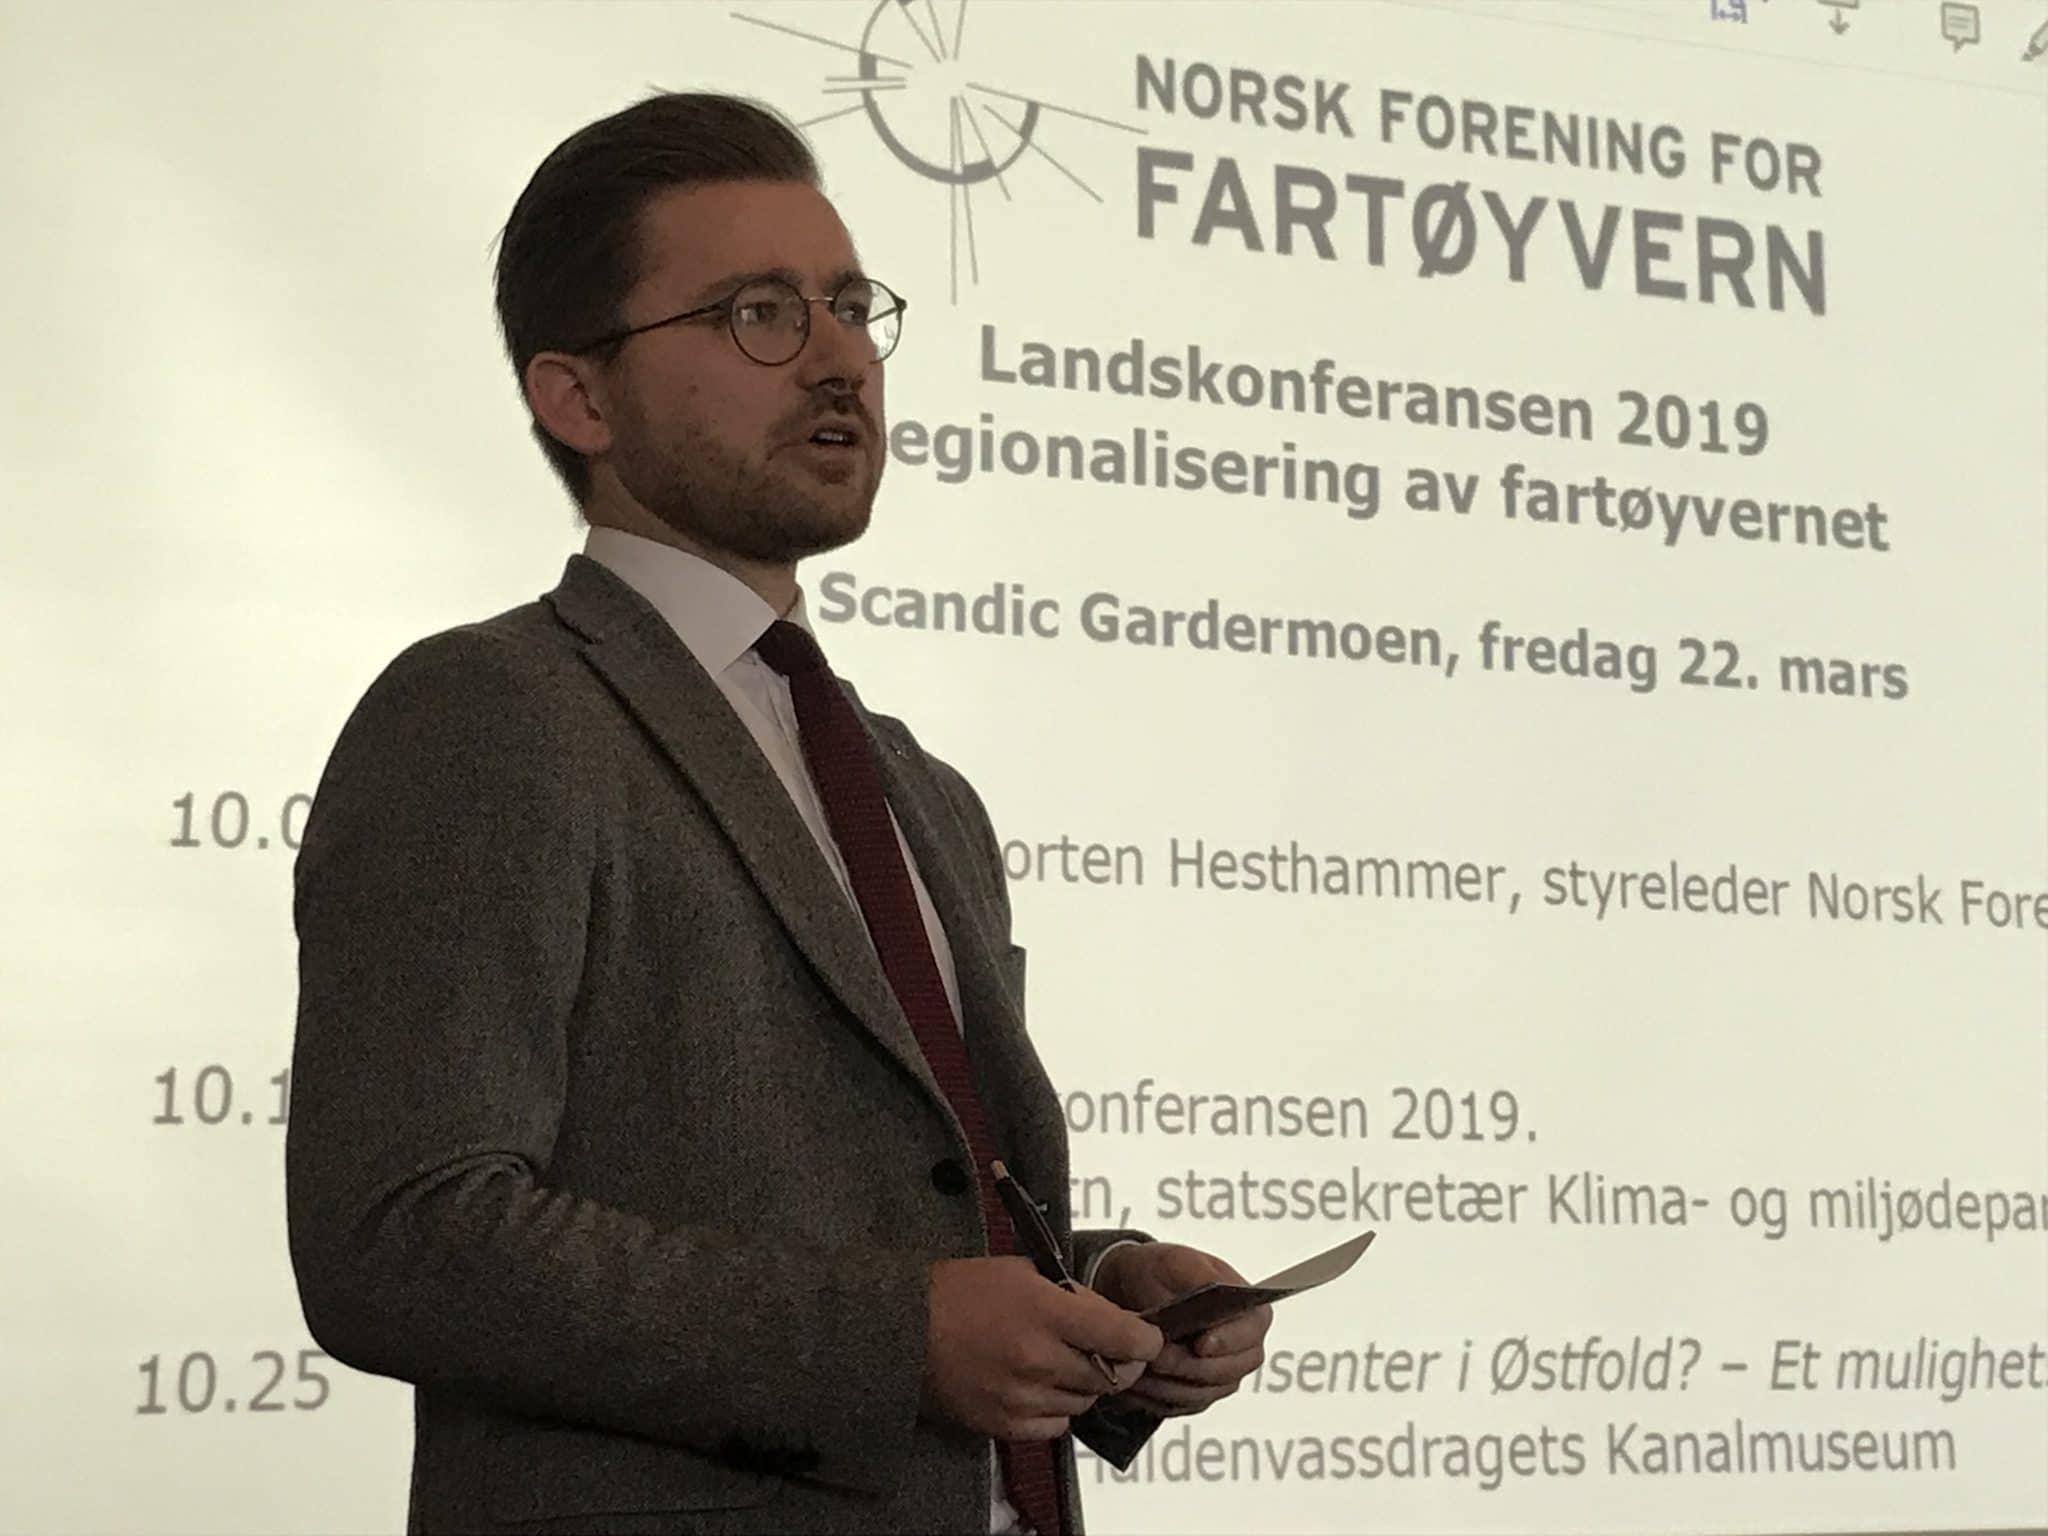 Foto av Klima- og miljøminister Sveinung Rotevatn fra Venstre